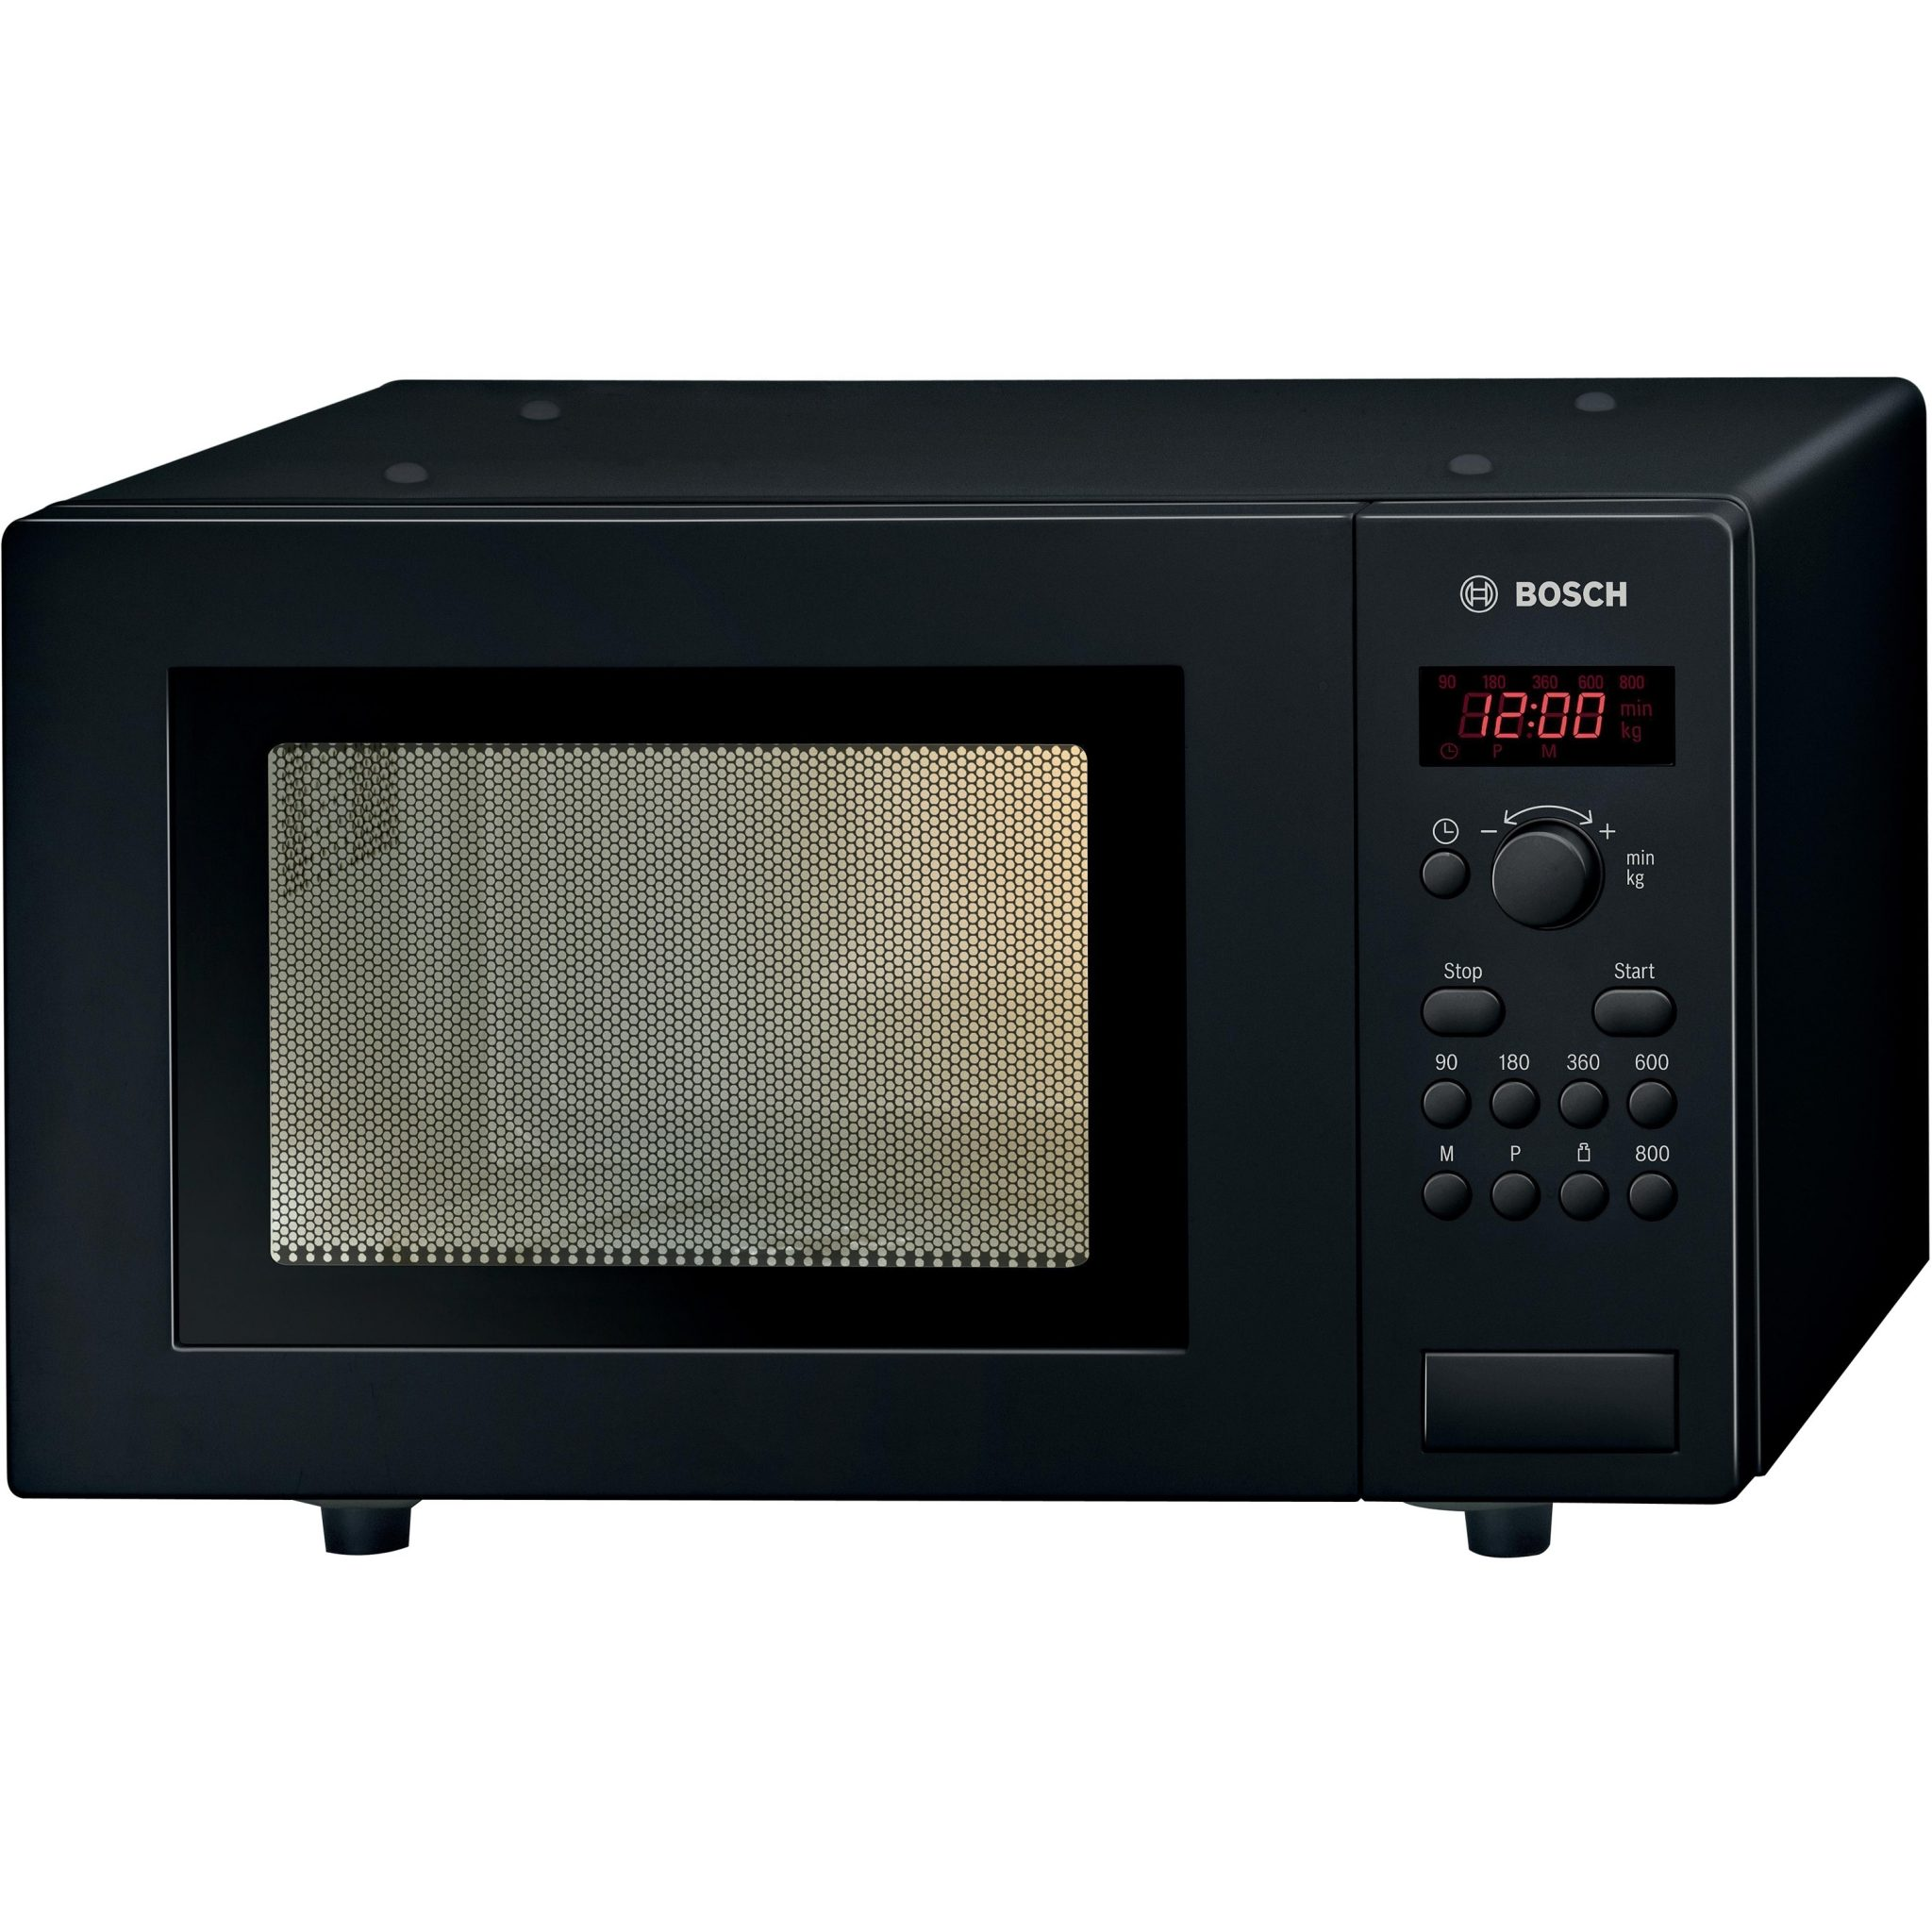 Bosch HMT75M461B Microwave Oven